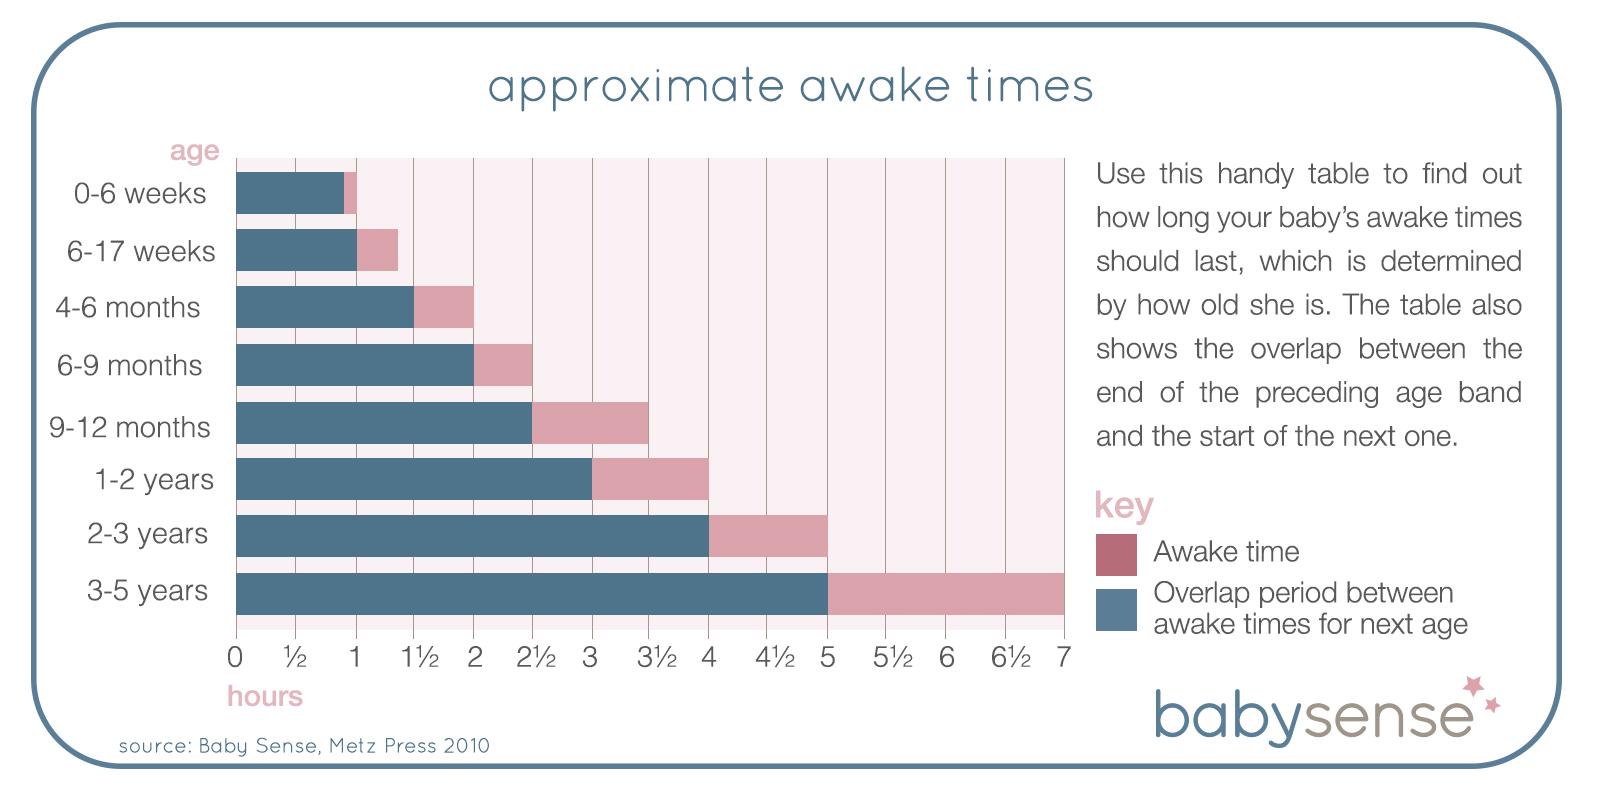 approximate-awake-times